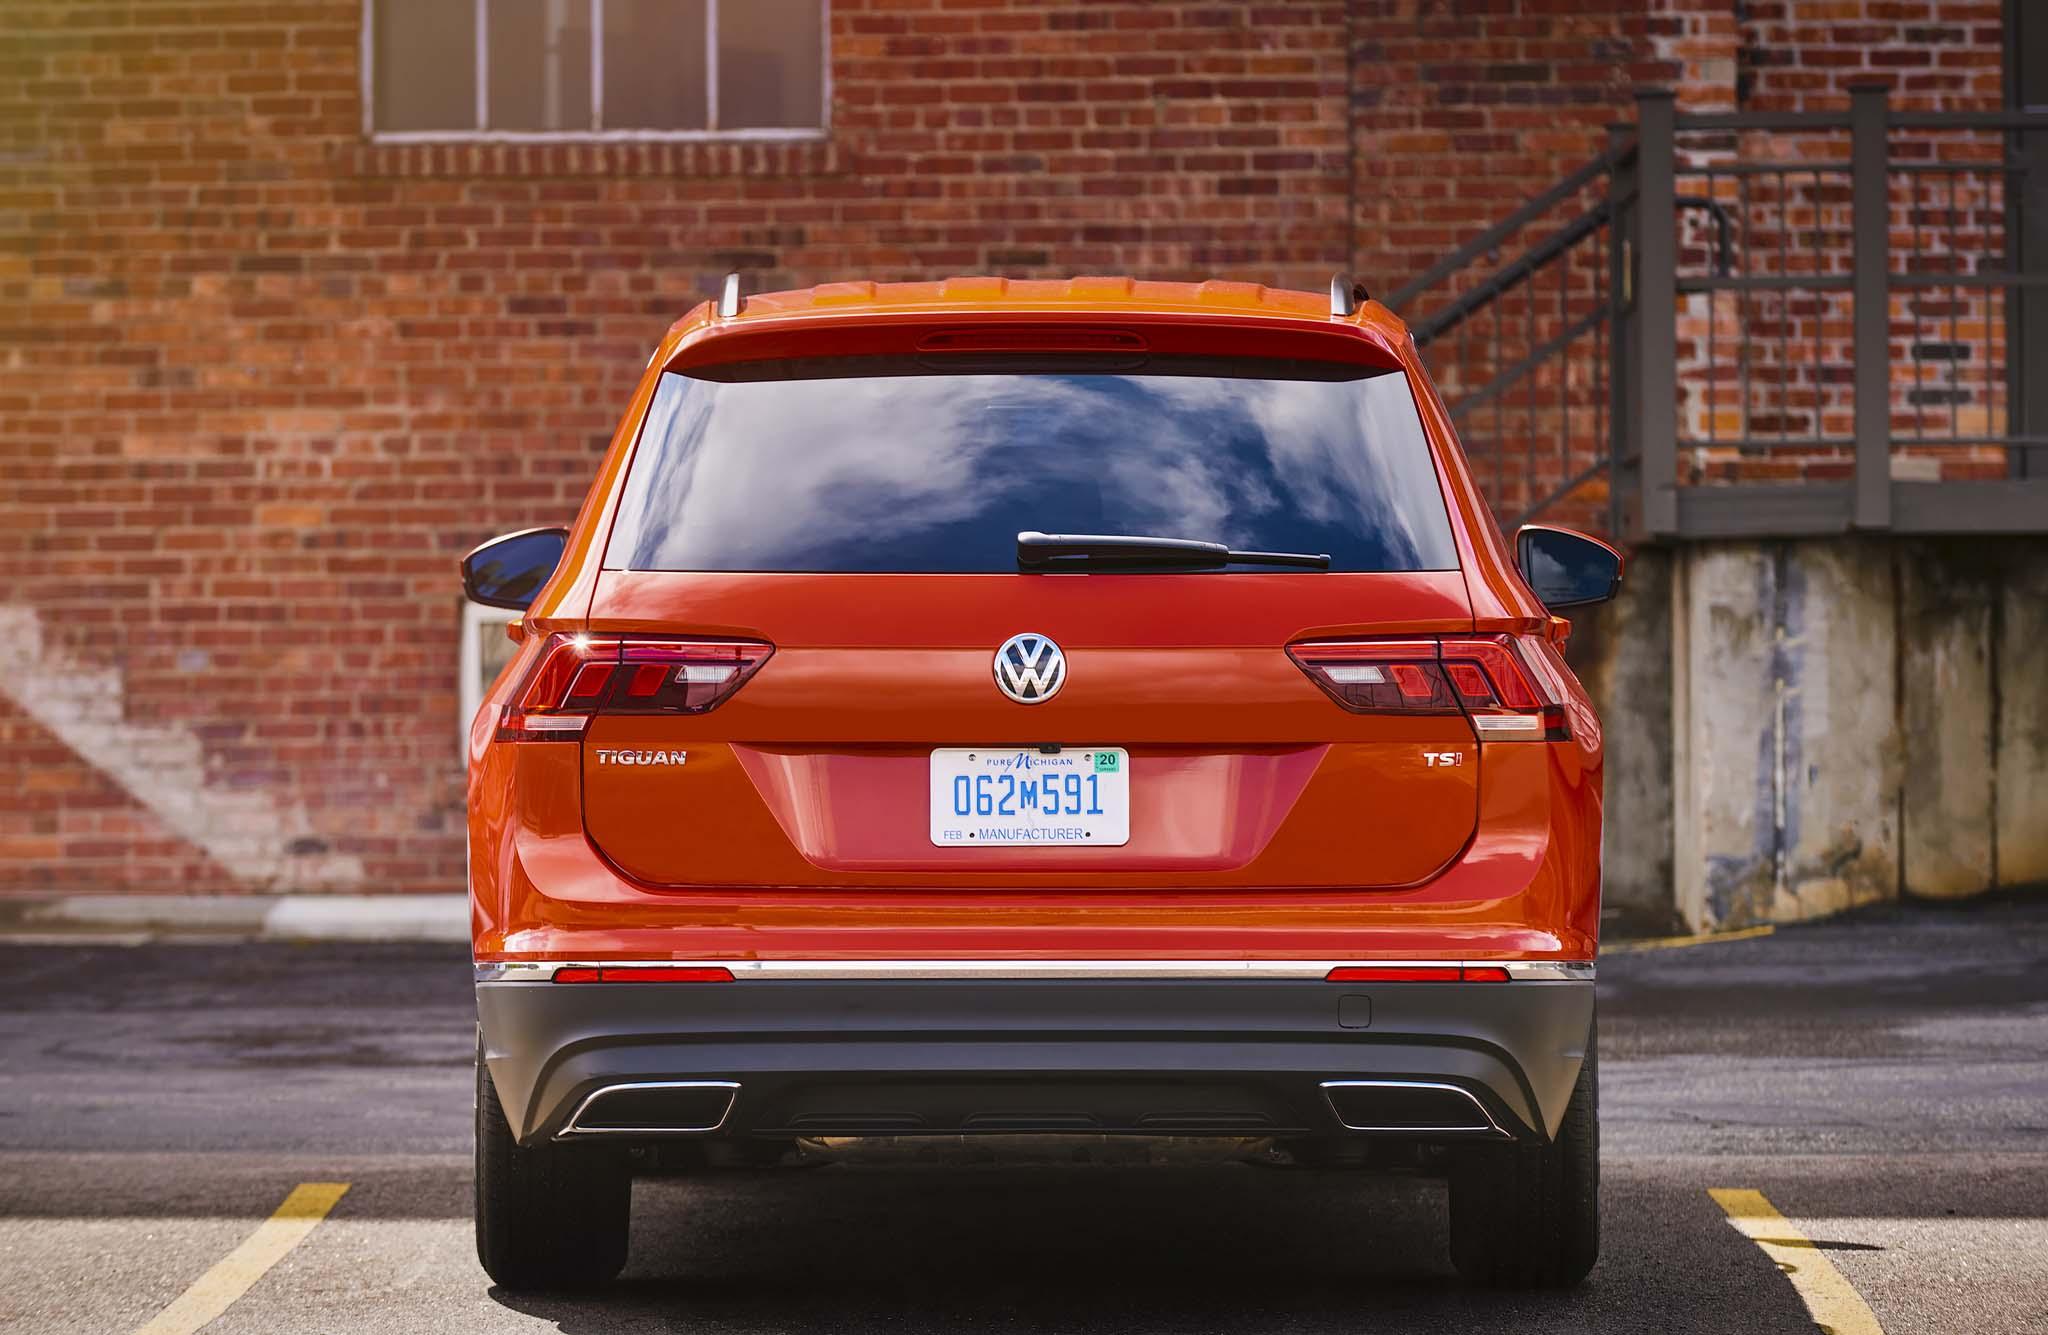 First Drive: 2018 Volkswagen Tiguan | Automobile Magazine